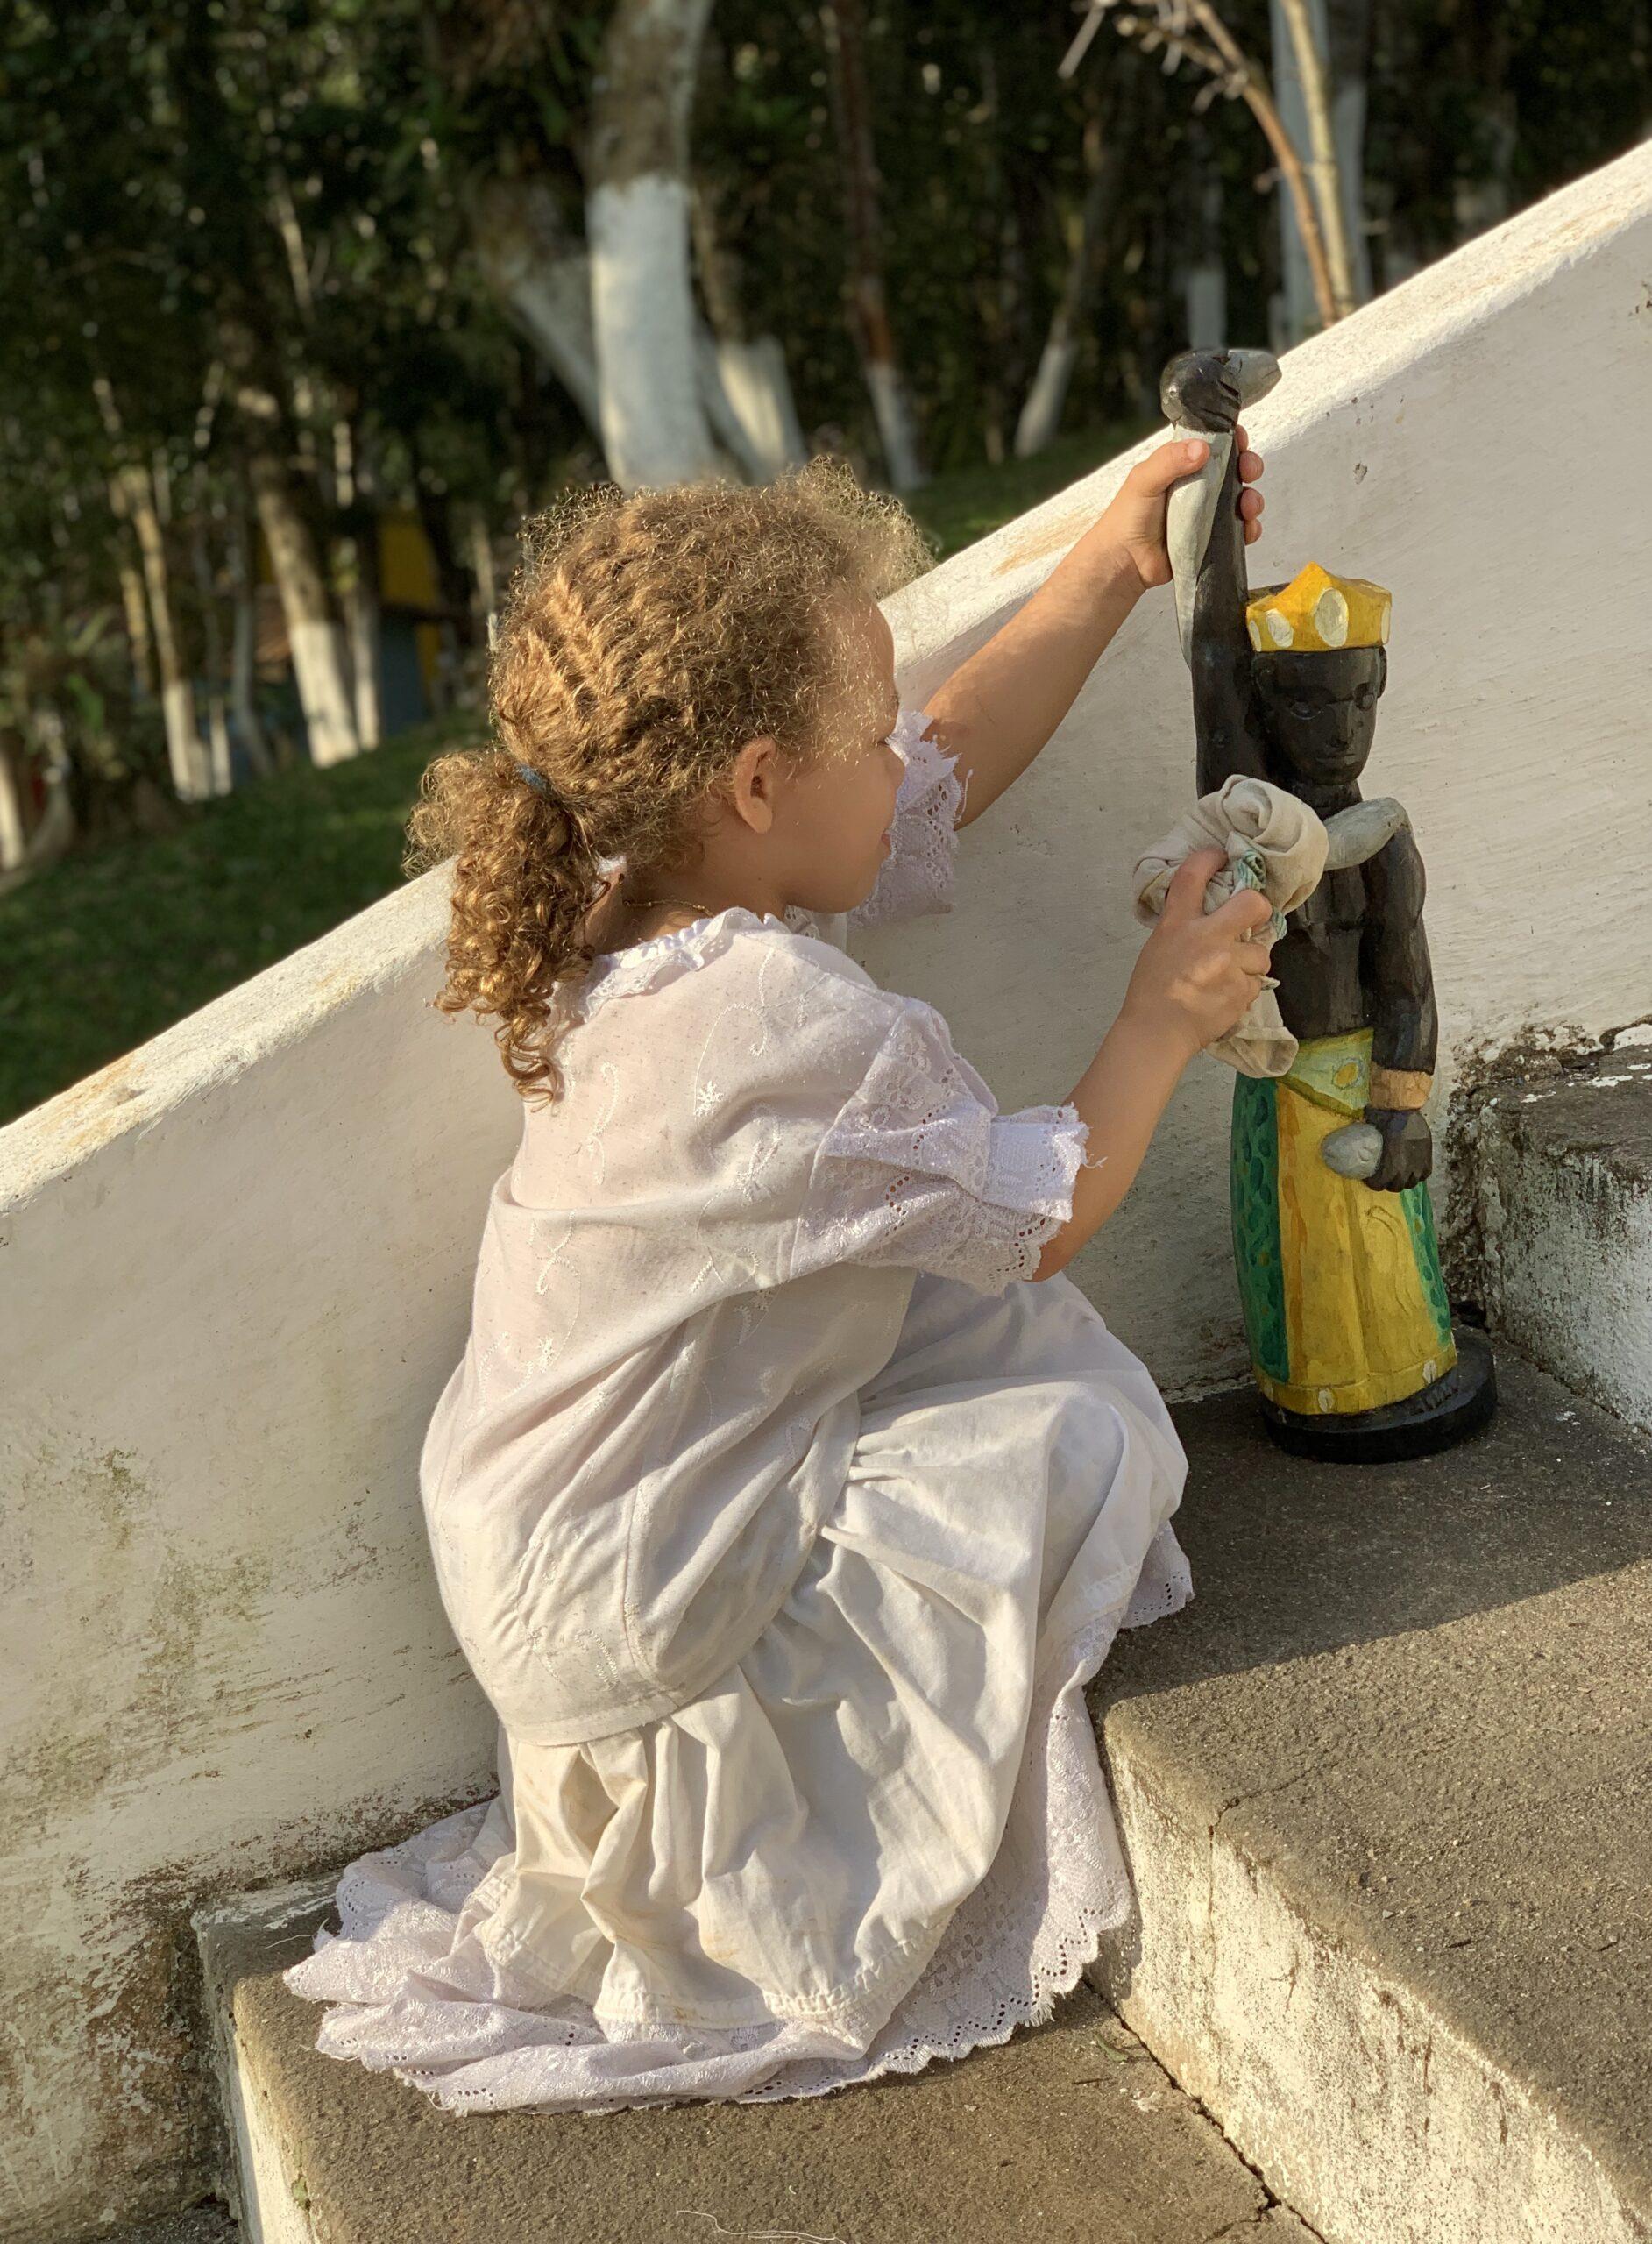 candomble-milano-mostra-fotografica-di-iuri-marc-brasile-sacro-lincontro-fra-aiye-e-orum